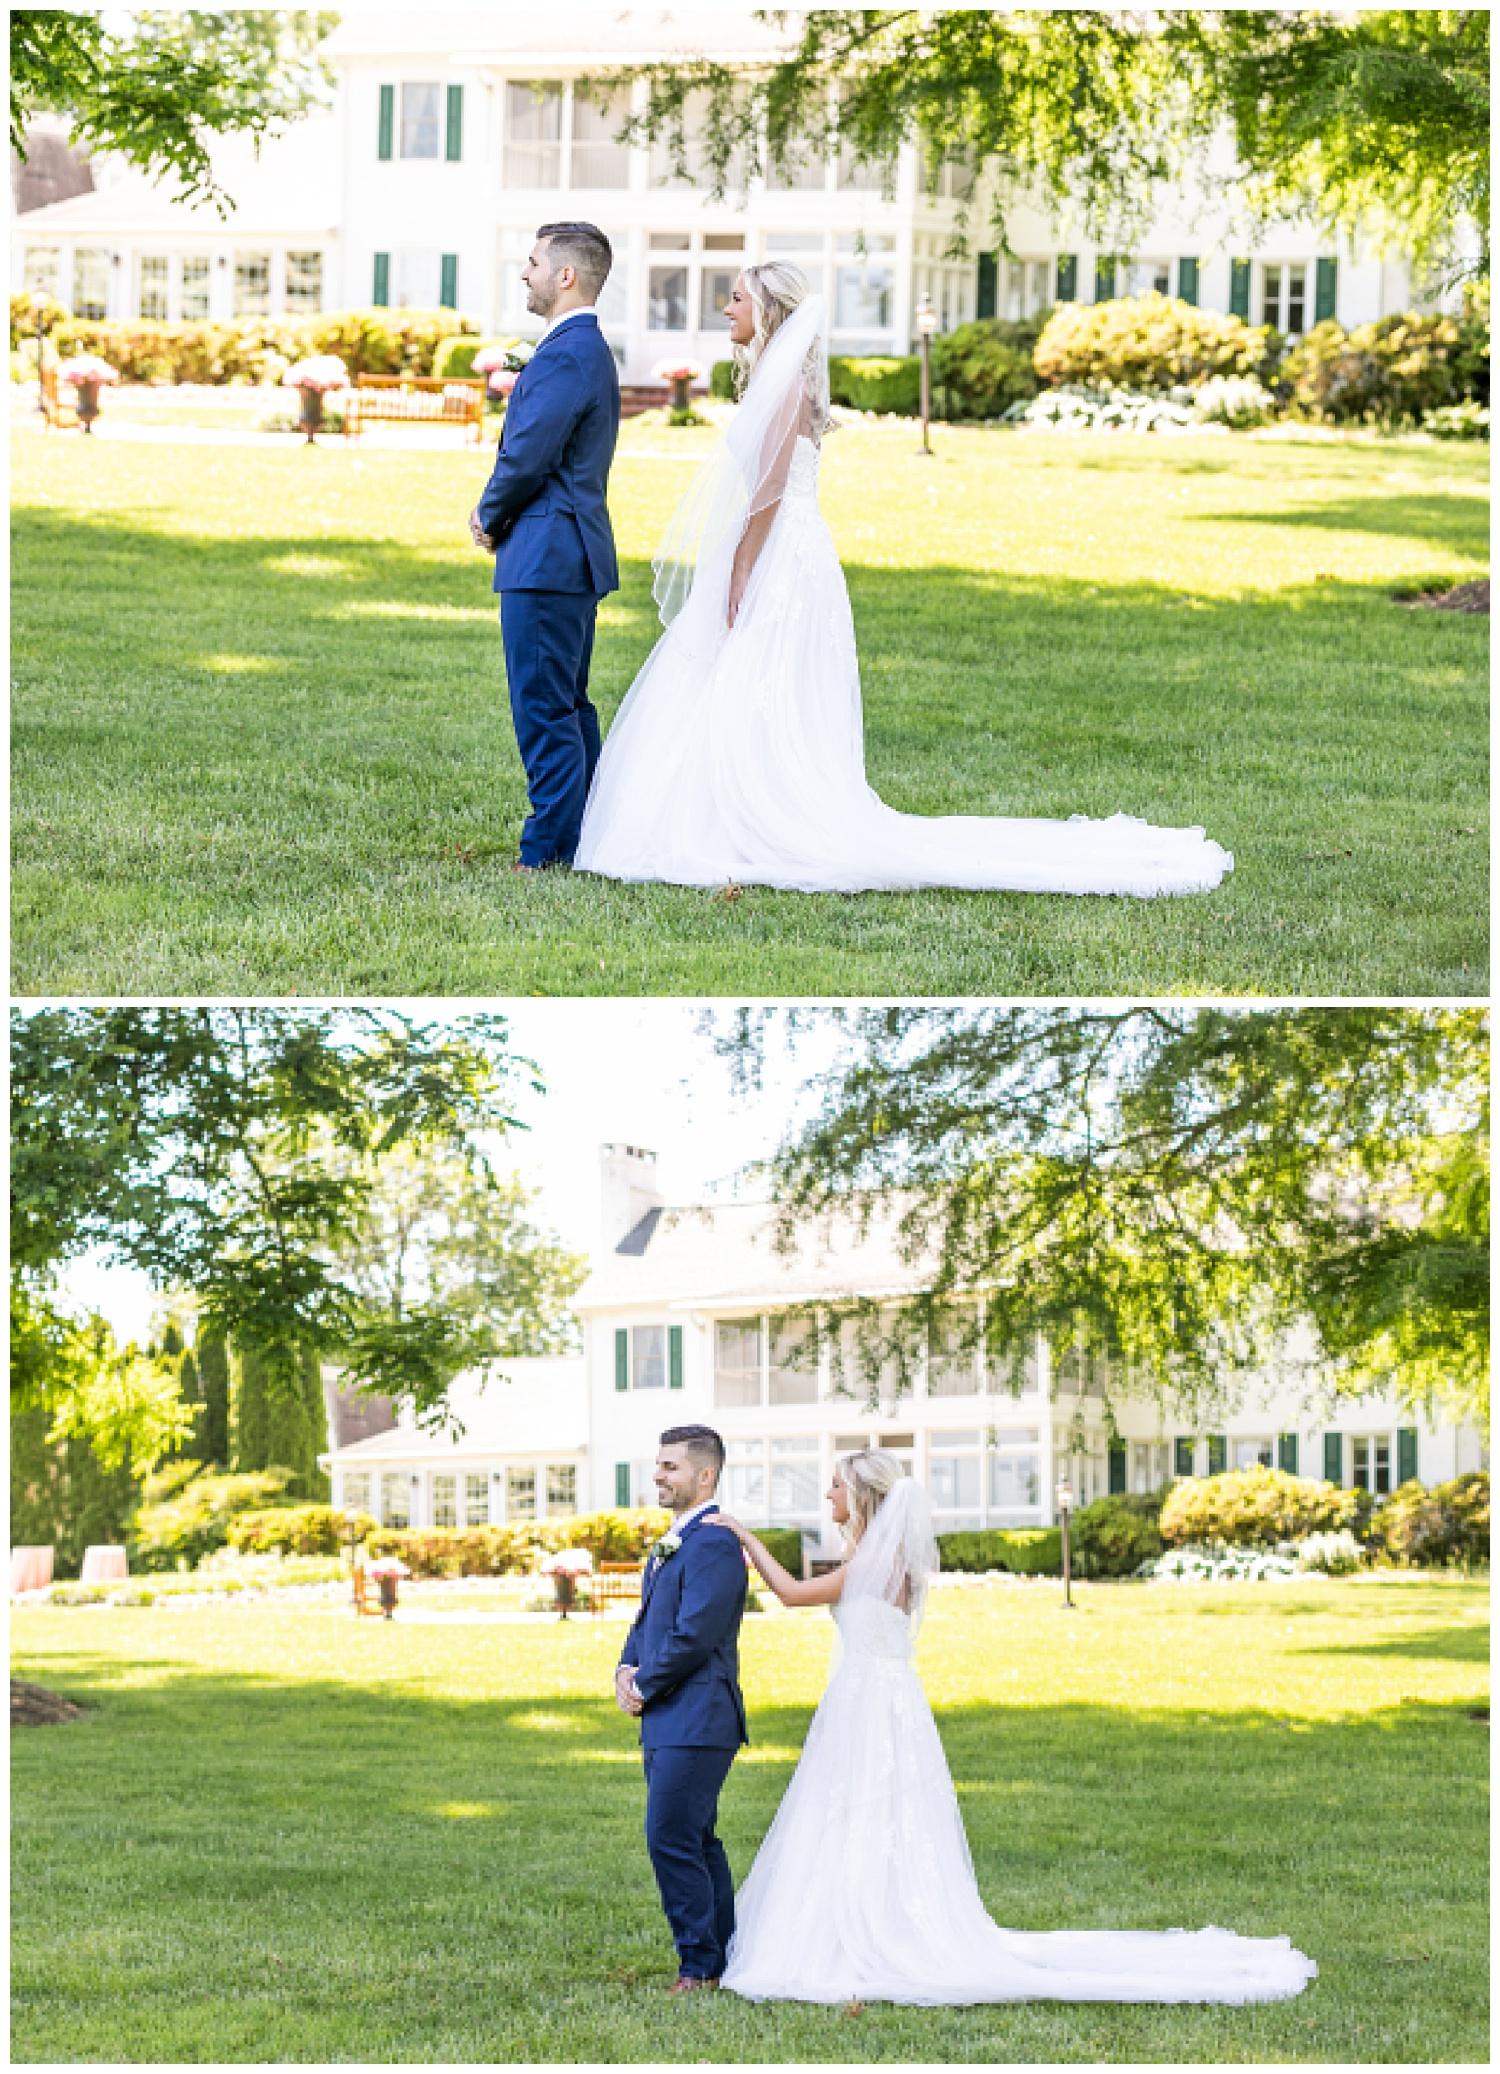 Kelly Mike Swan Harbor Farm Wedding Living Radiant Photography photos_0027.jpg